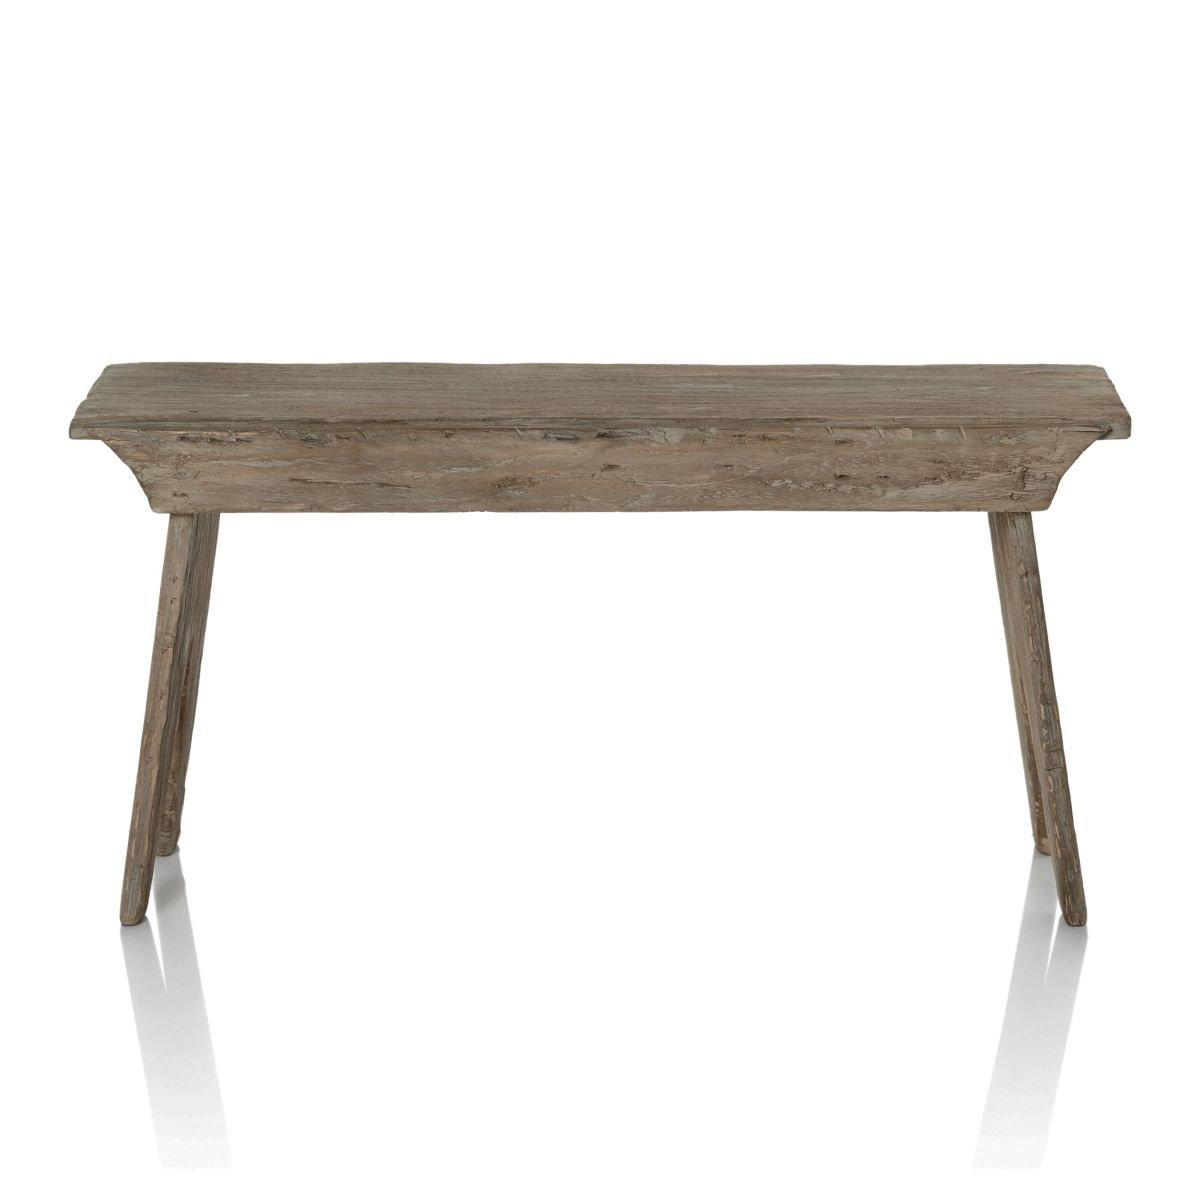 IMPRESSIONEN living Bank - Rustikal - Sitzbank aus recyceltem Holz - ca. B90 x H44 x T29 cm